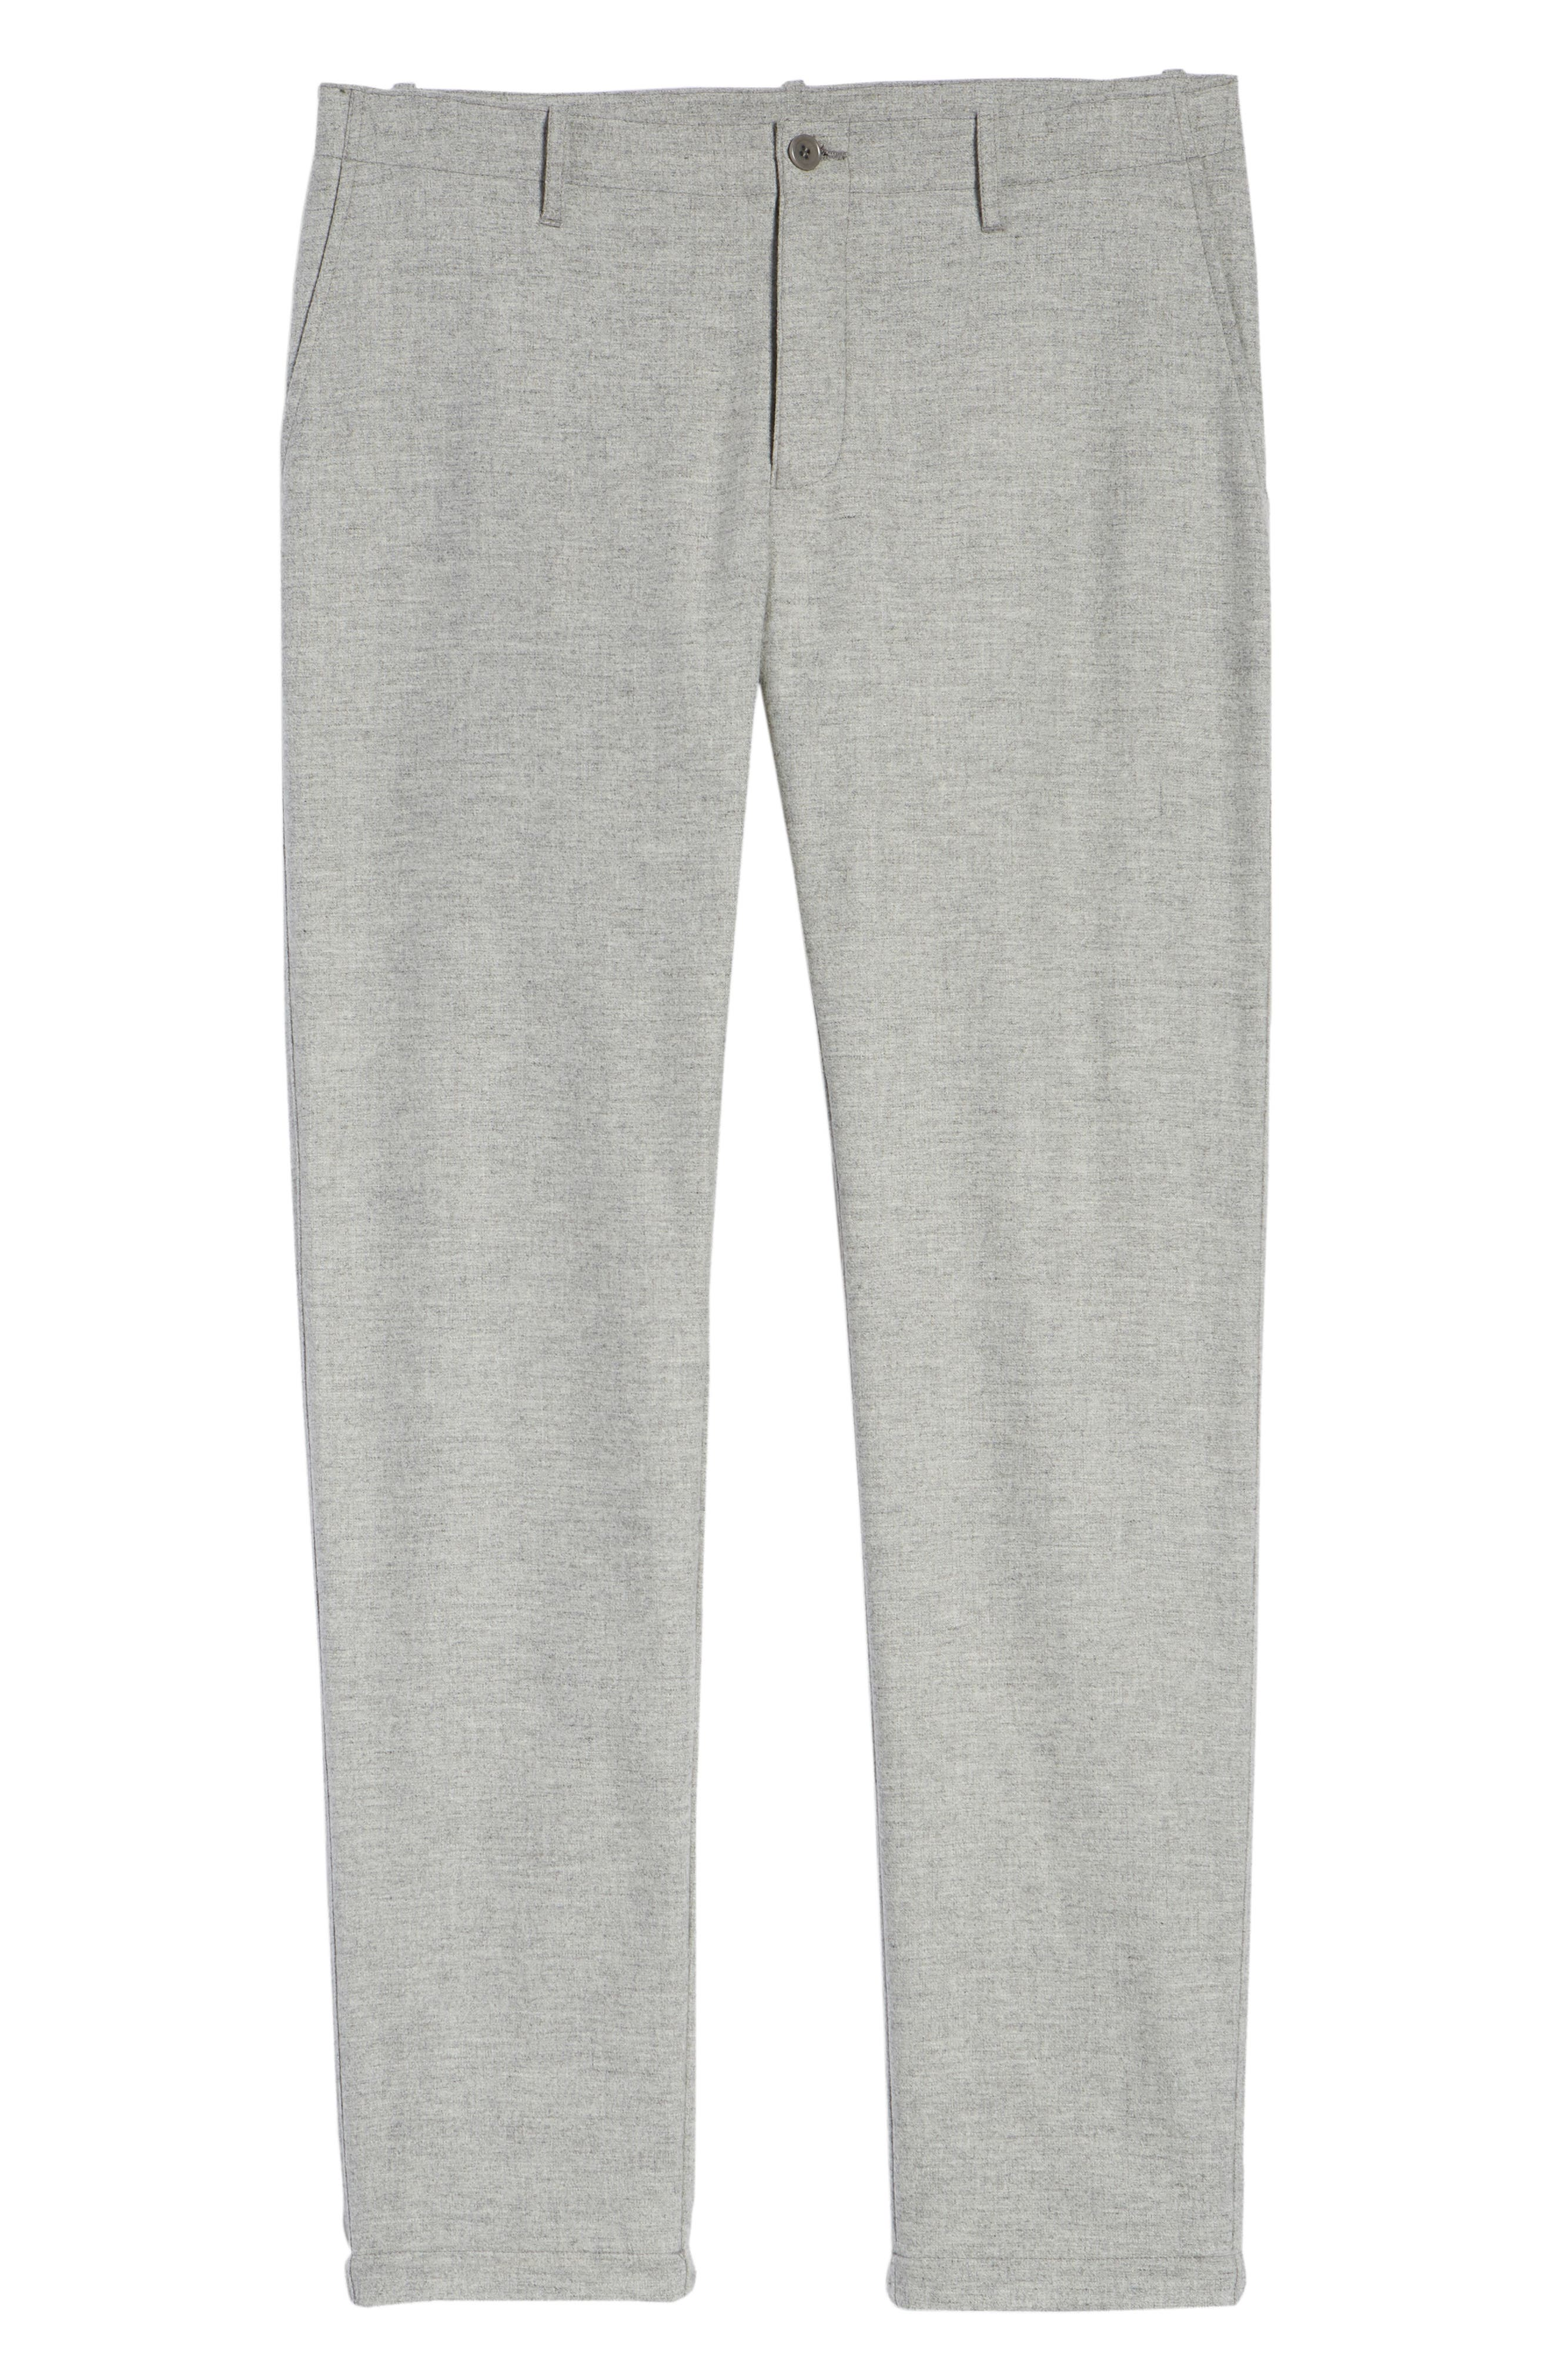 DJVU Slim Fit Trousers,                             Alternate thumbnail 6, color,                             027